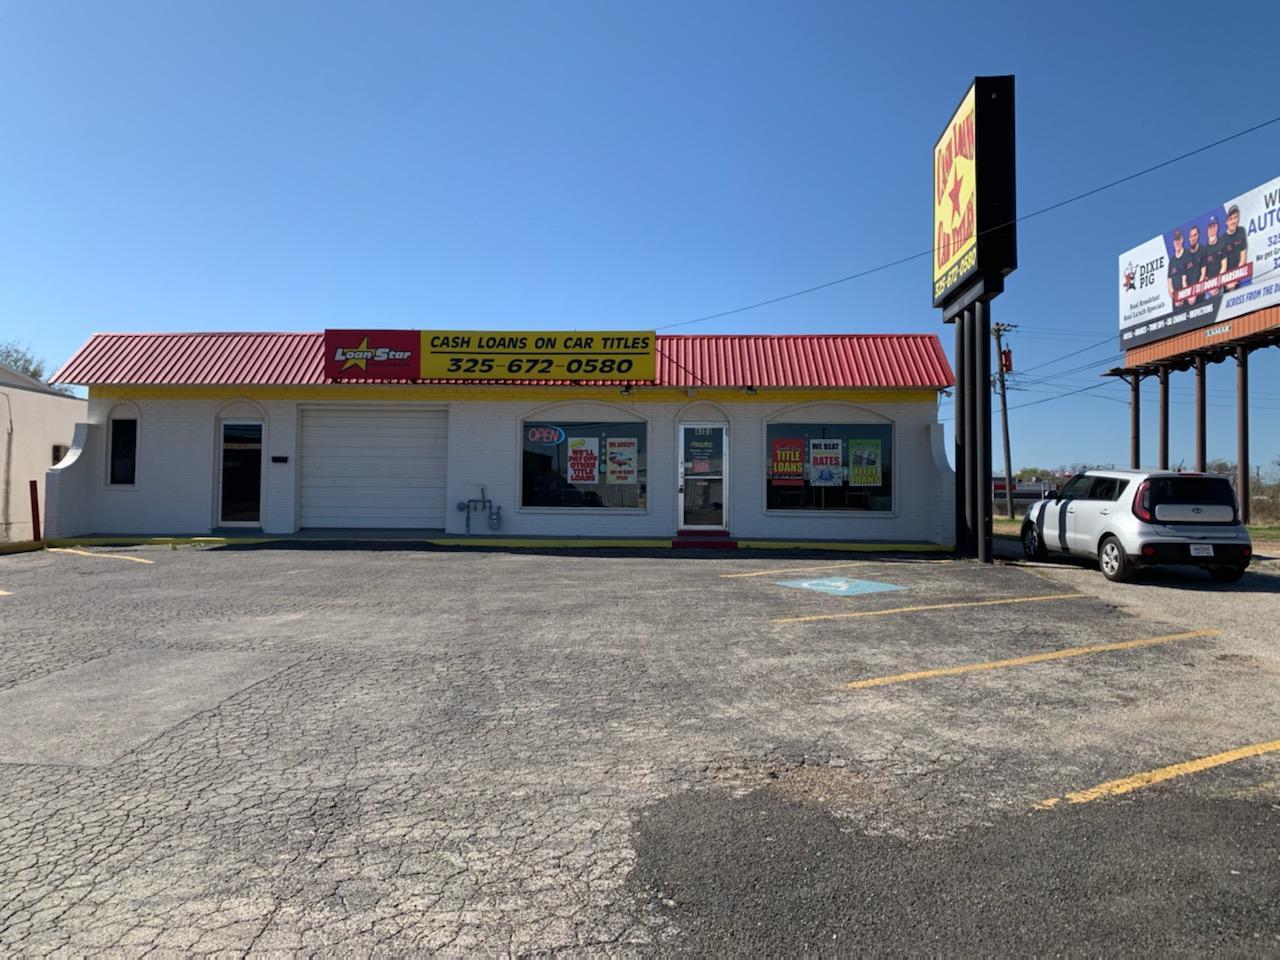 5 Mar Vista Place, Horizon City, TX 79928 (MLS #